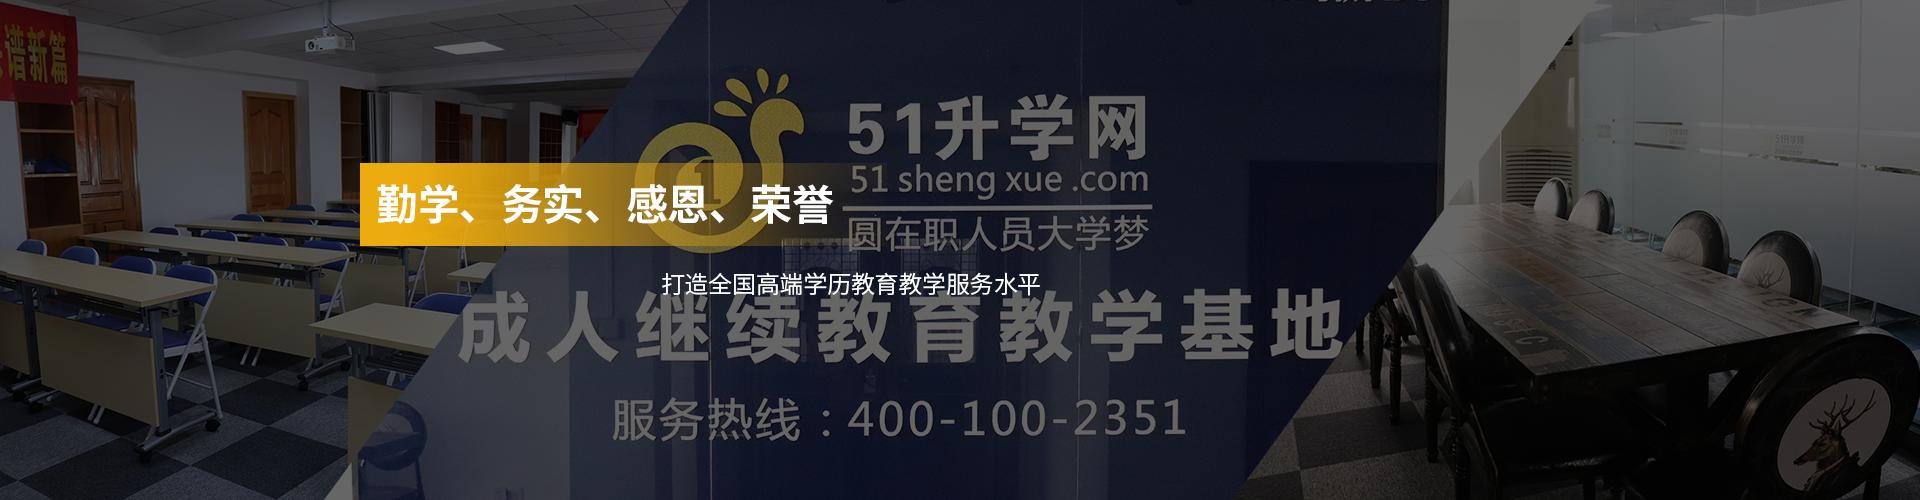 http://www.51shengxue.com/data/upload/202005/20200525142335_775.png